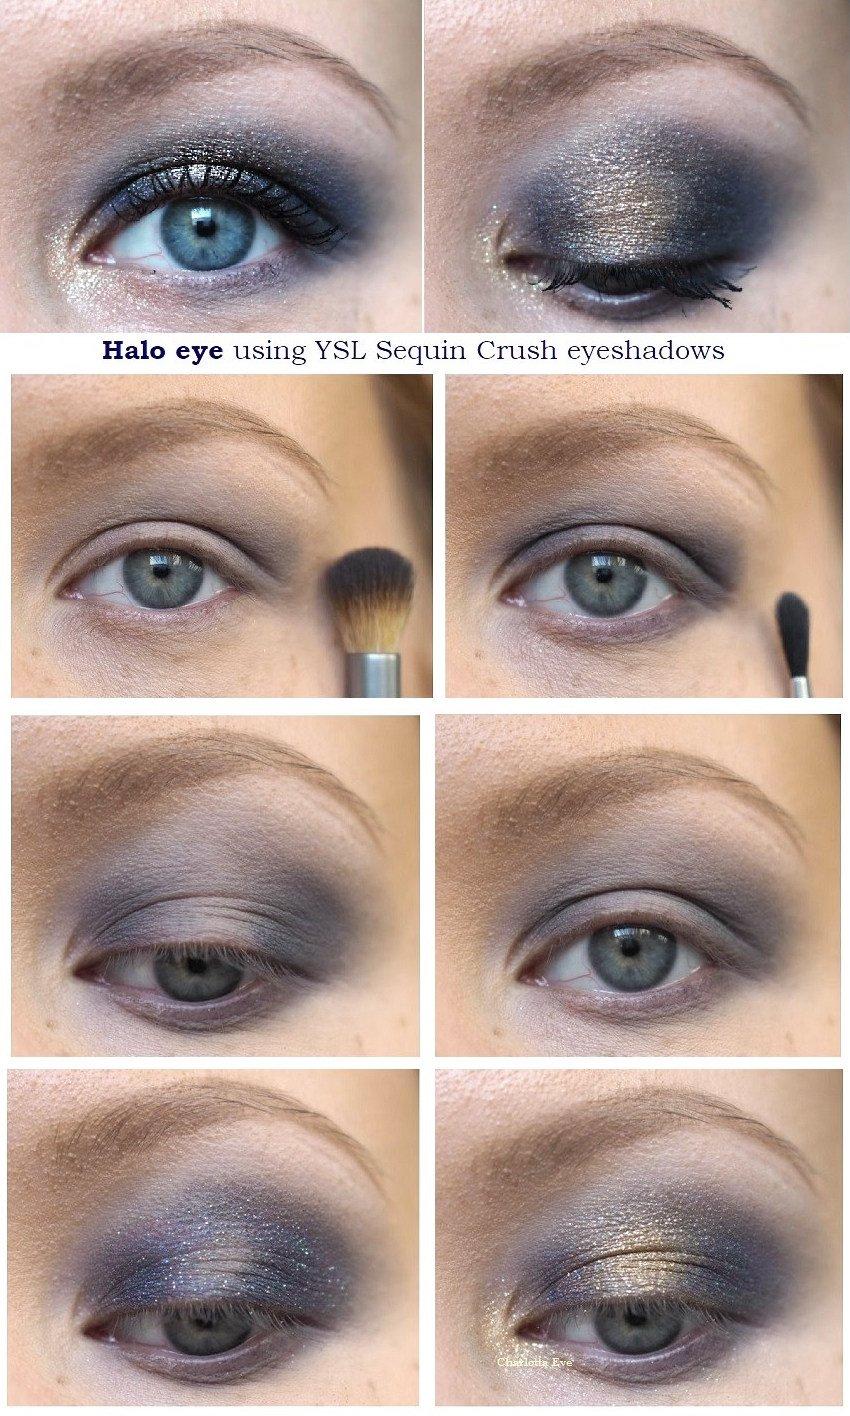 ysl sequin crush halo eye tutorial makeup